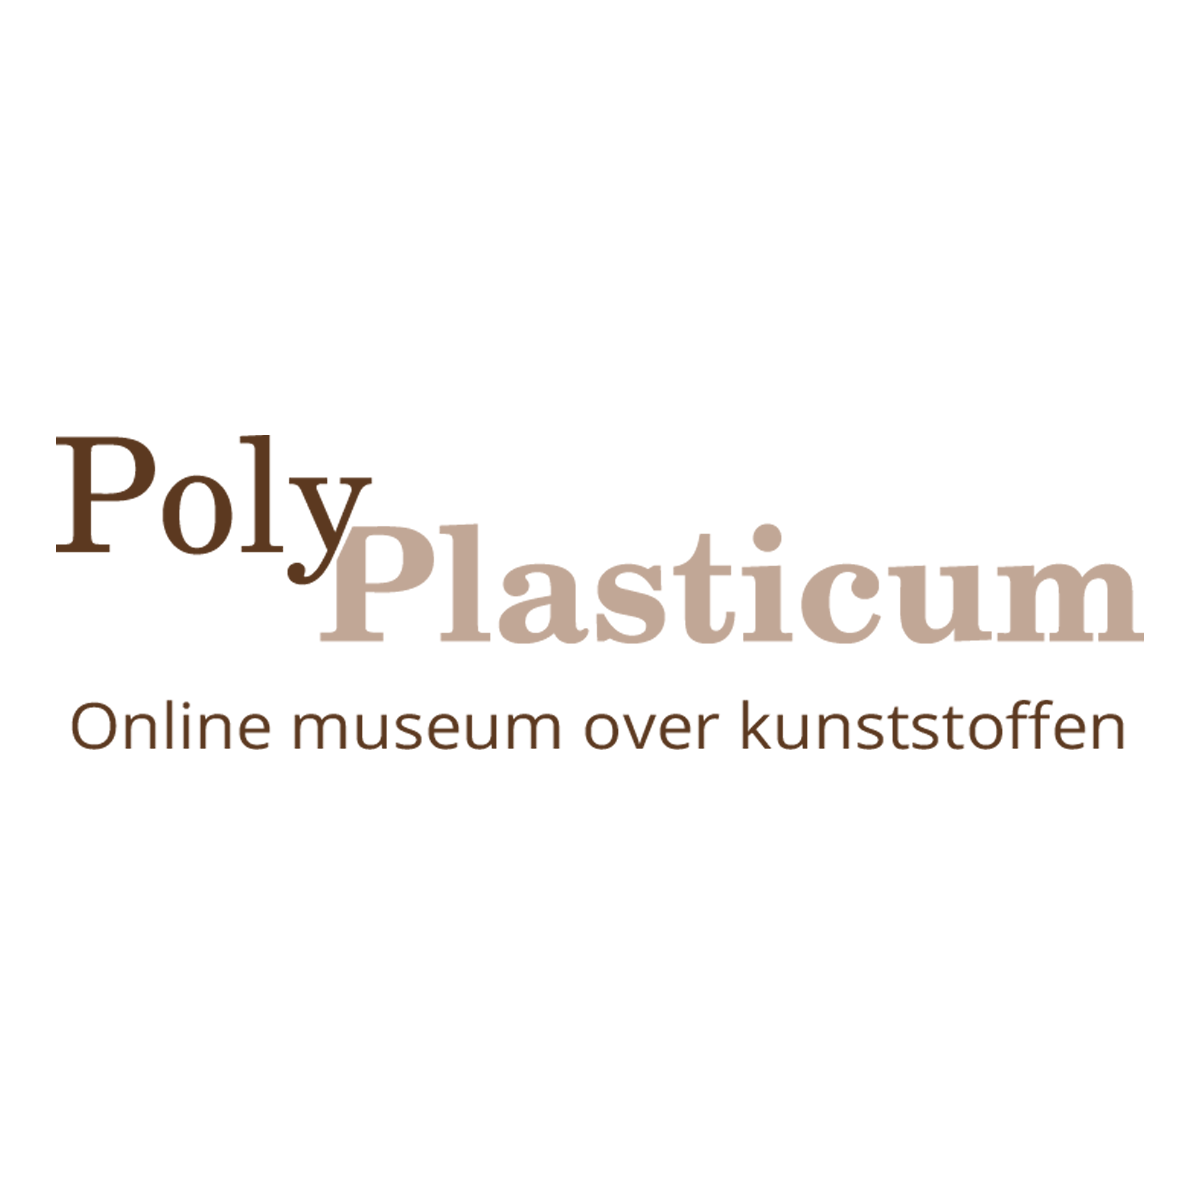 PolyPlasticum.png